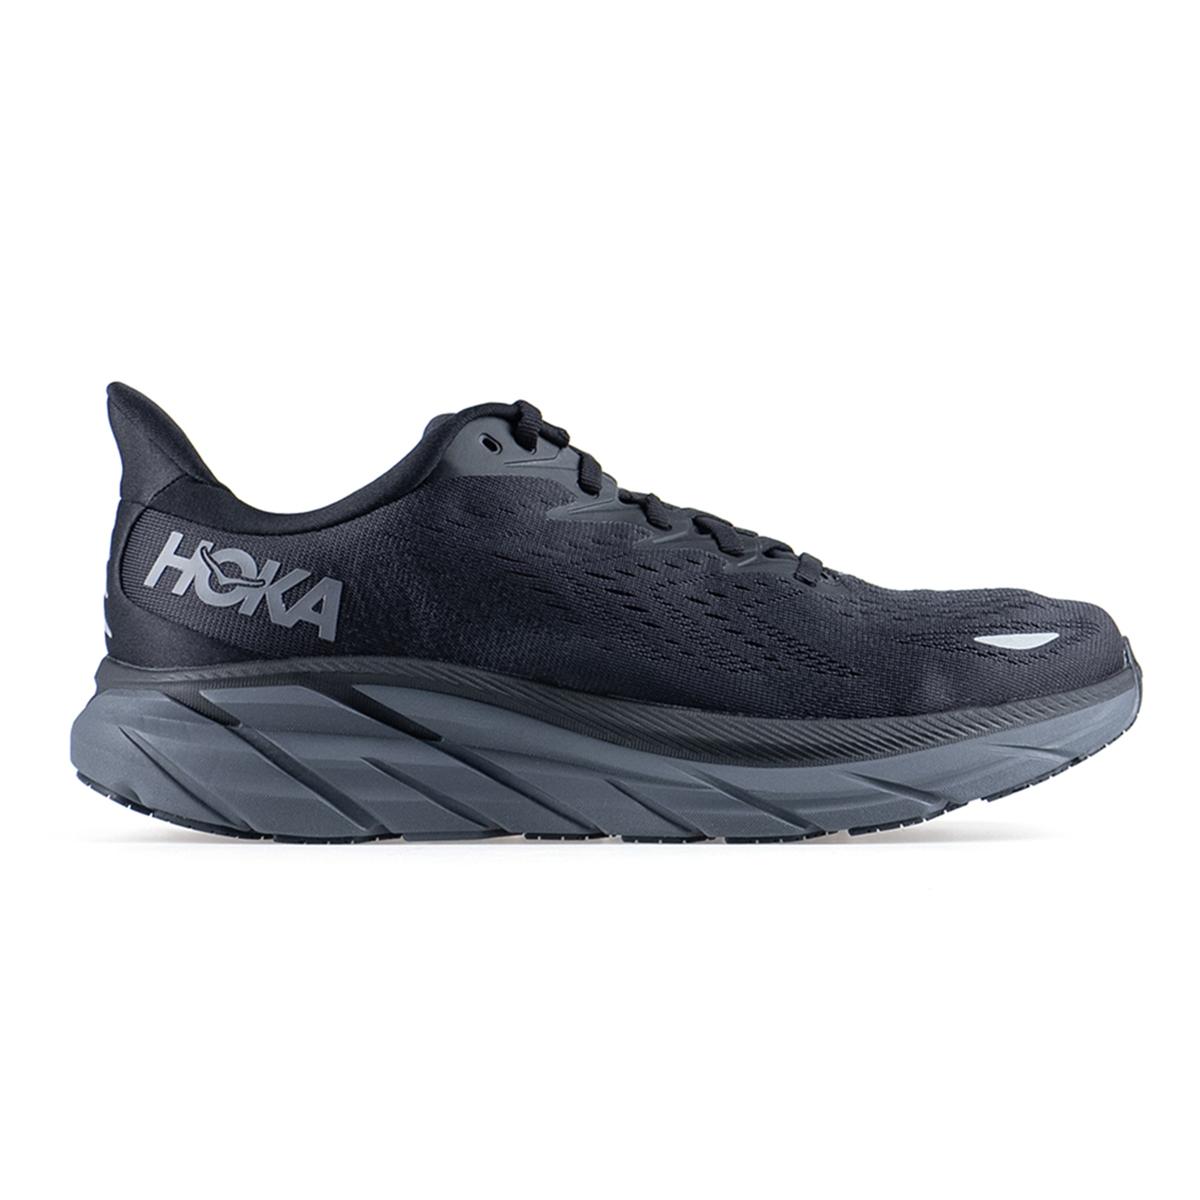 Men's Hoka One One Clifton 8 Running Shoe - Color: Black / Black - Size: 7 - Width: Regular, Black / Black, large, image 1